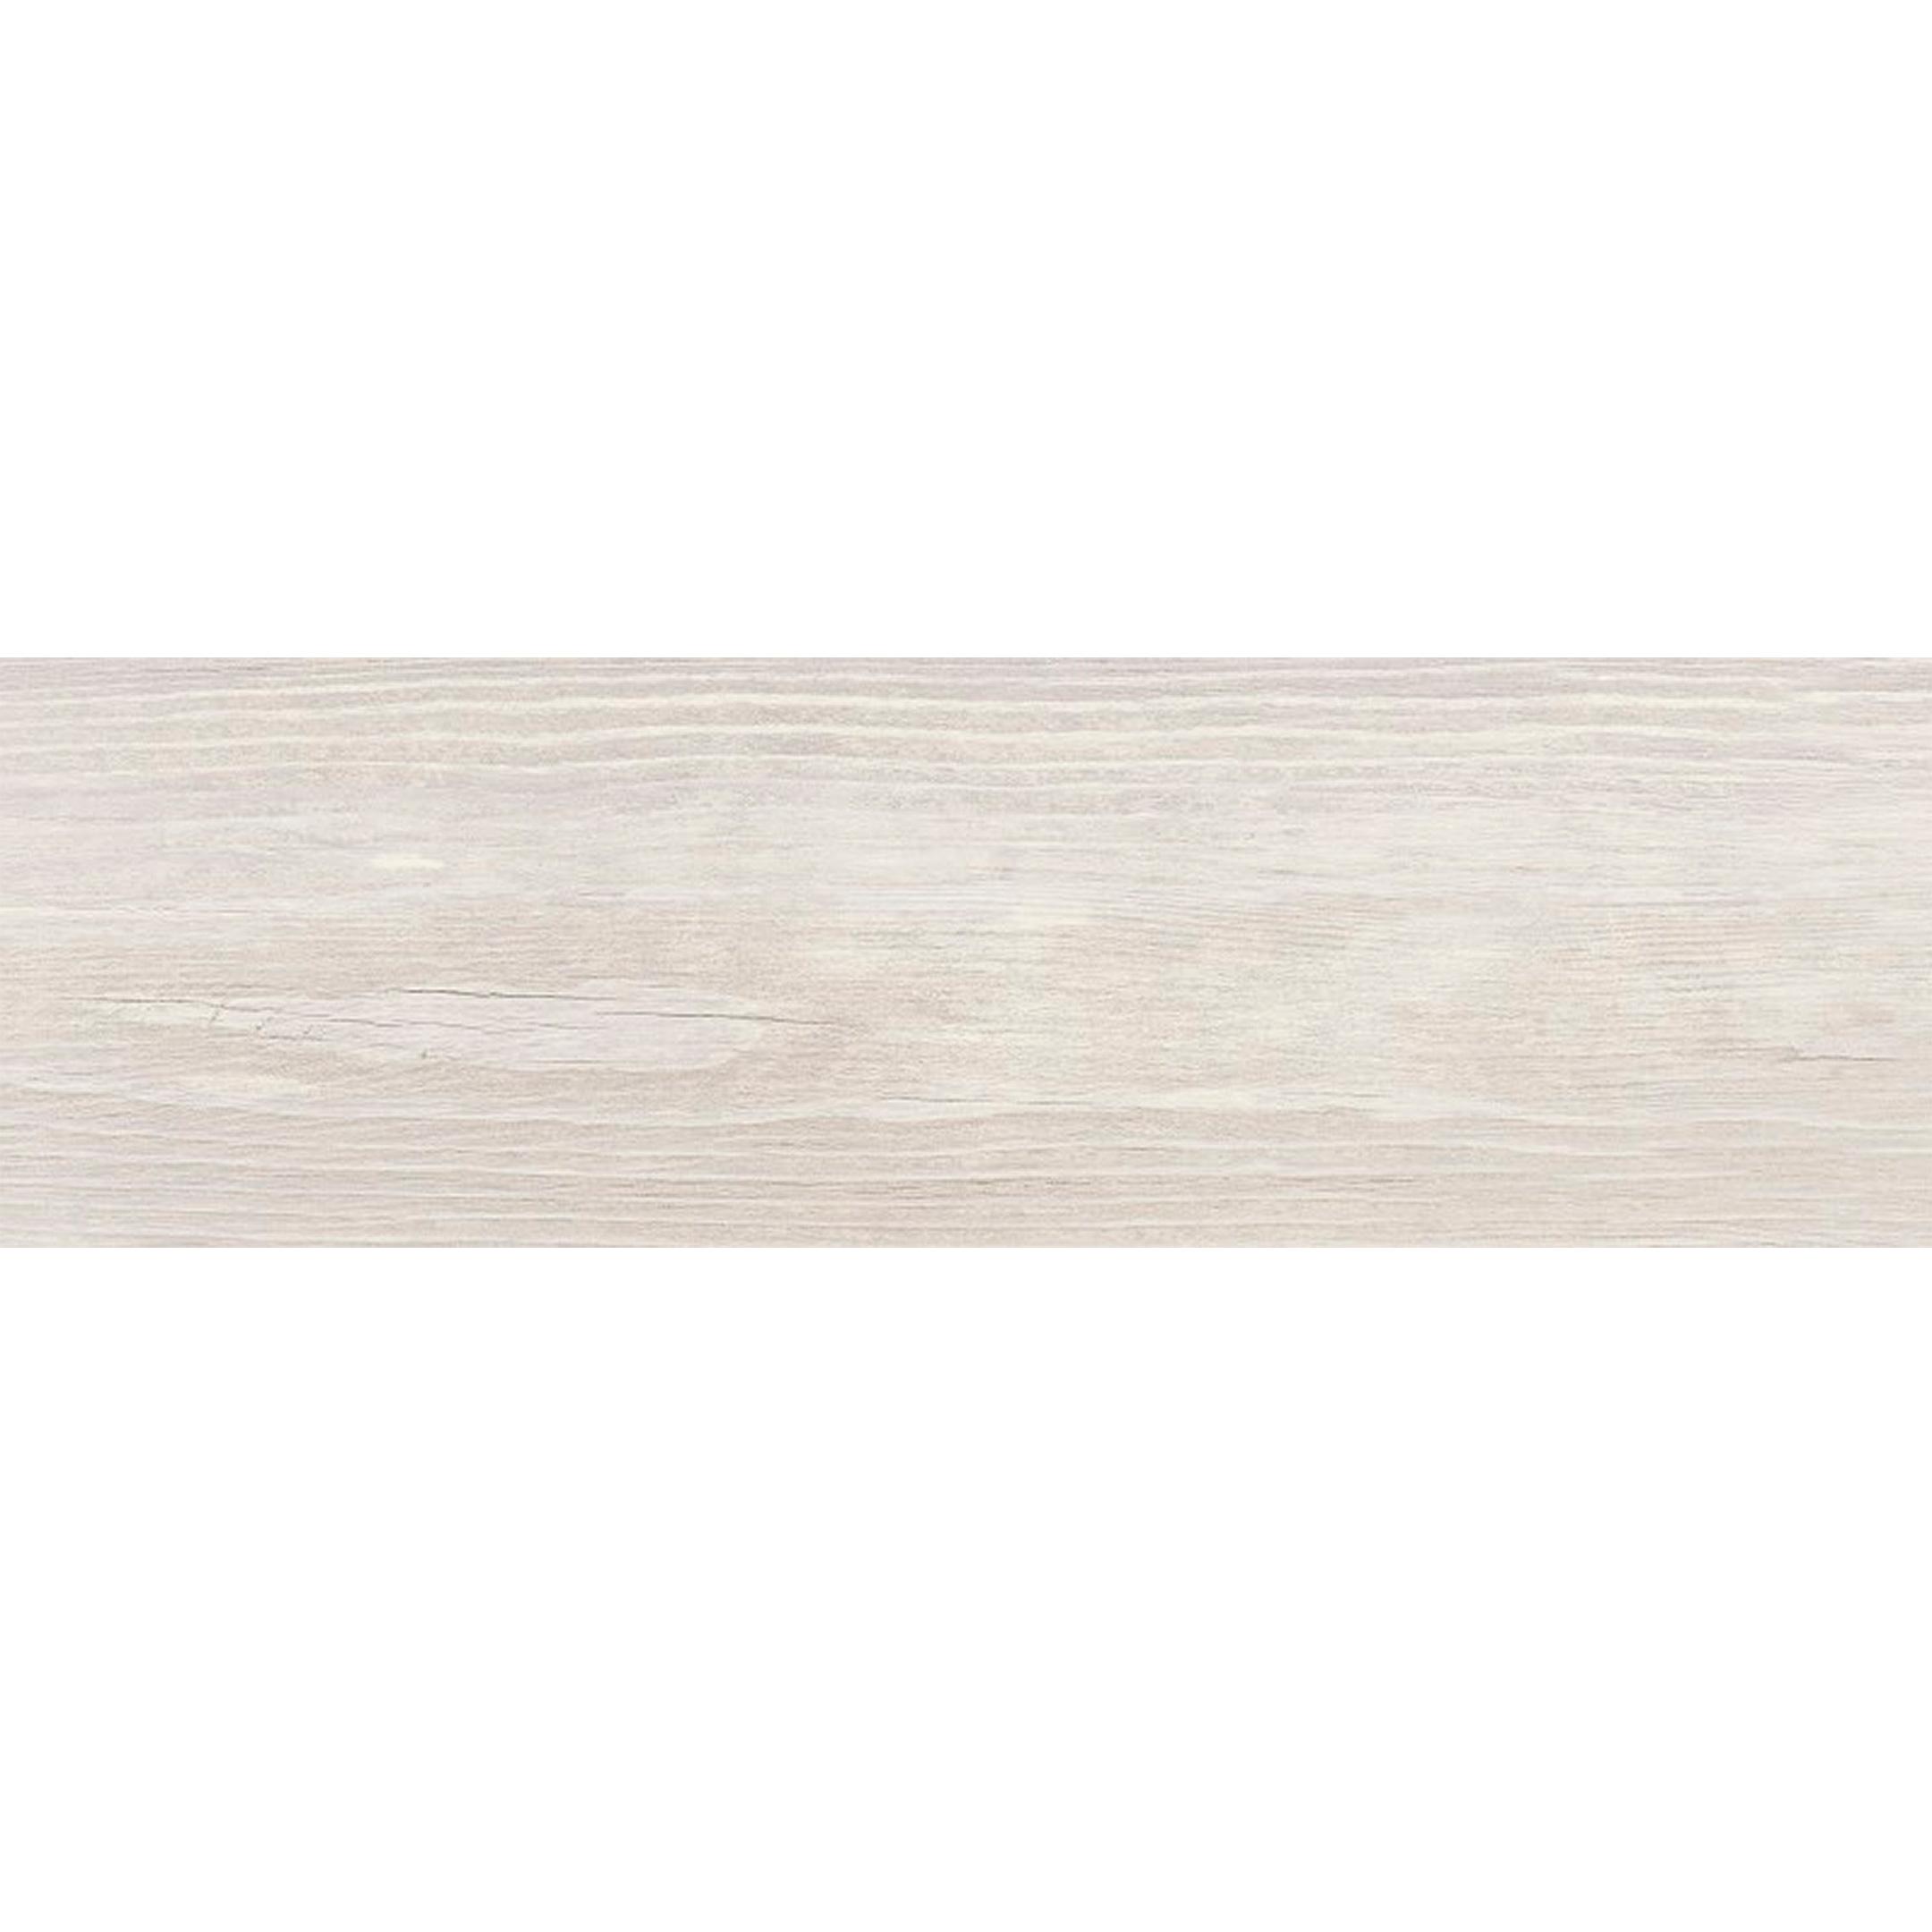 Керамогранит CERSANIT Finwood 185х598х9 мм белый (9 шт=0,99кв.м)